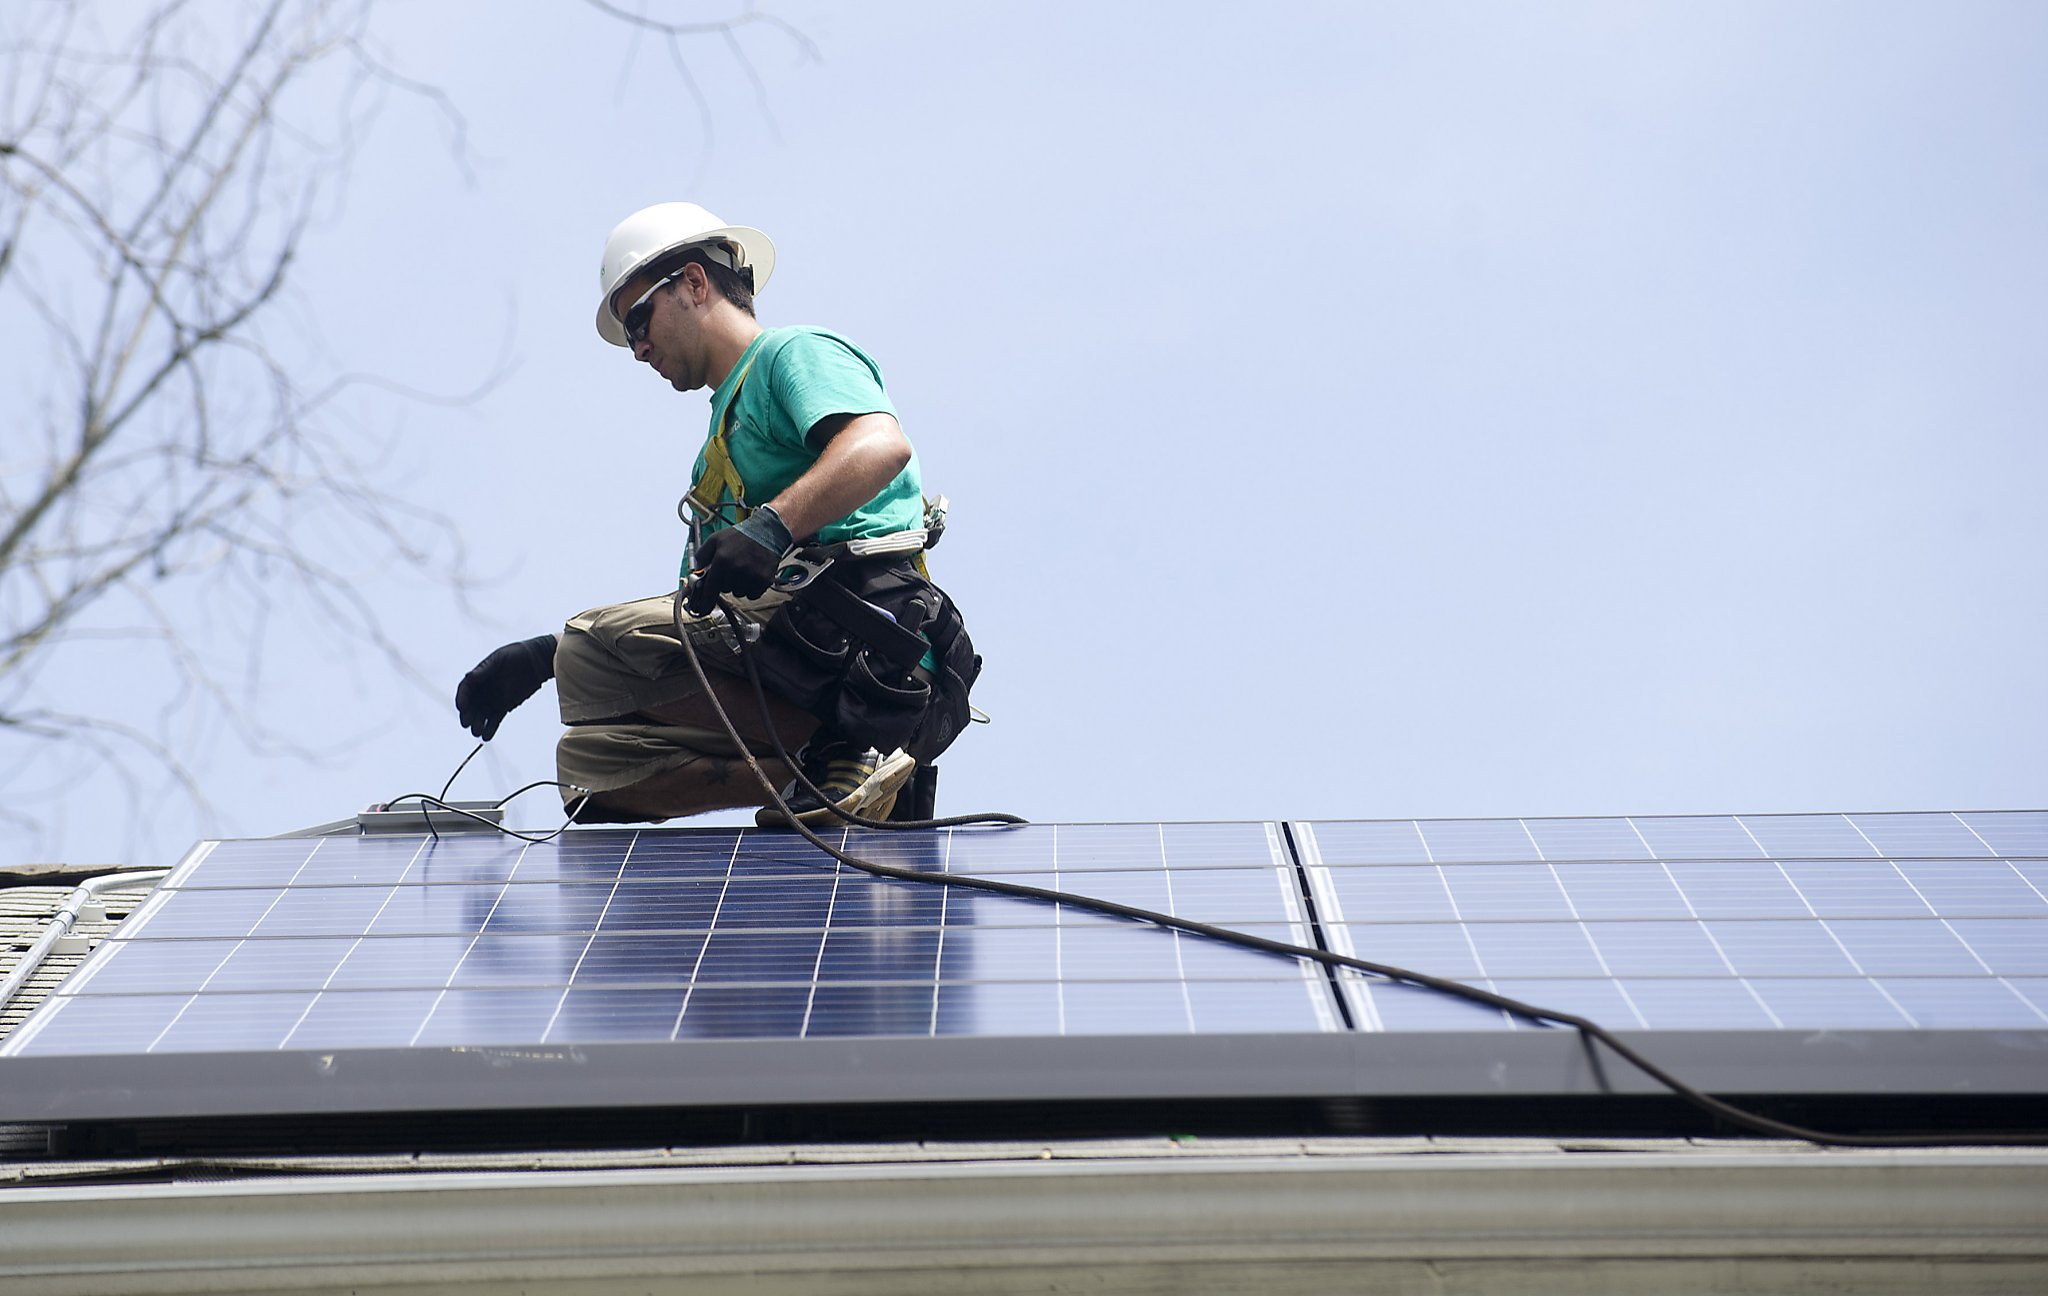 SolarCity to open Florida facility